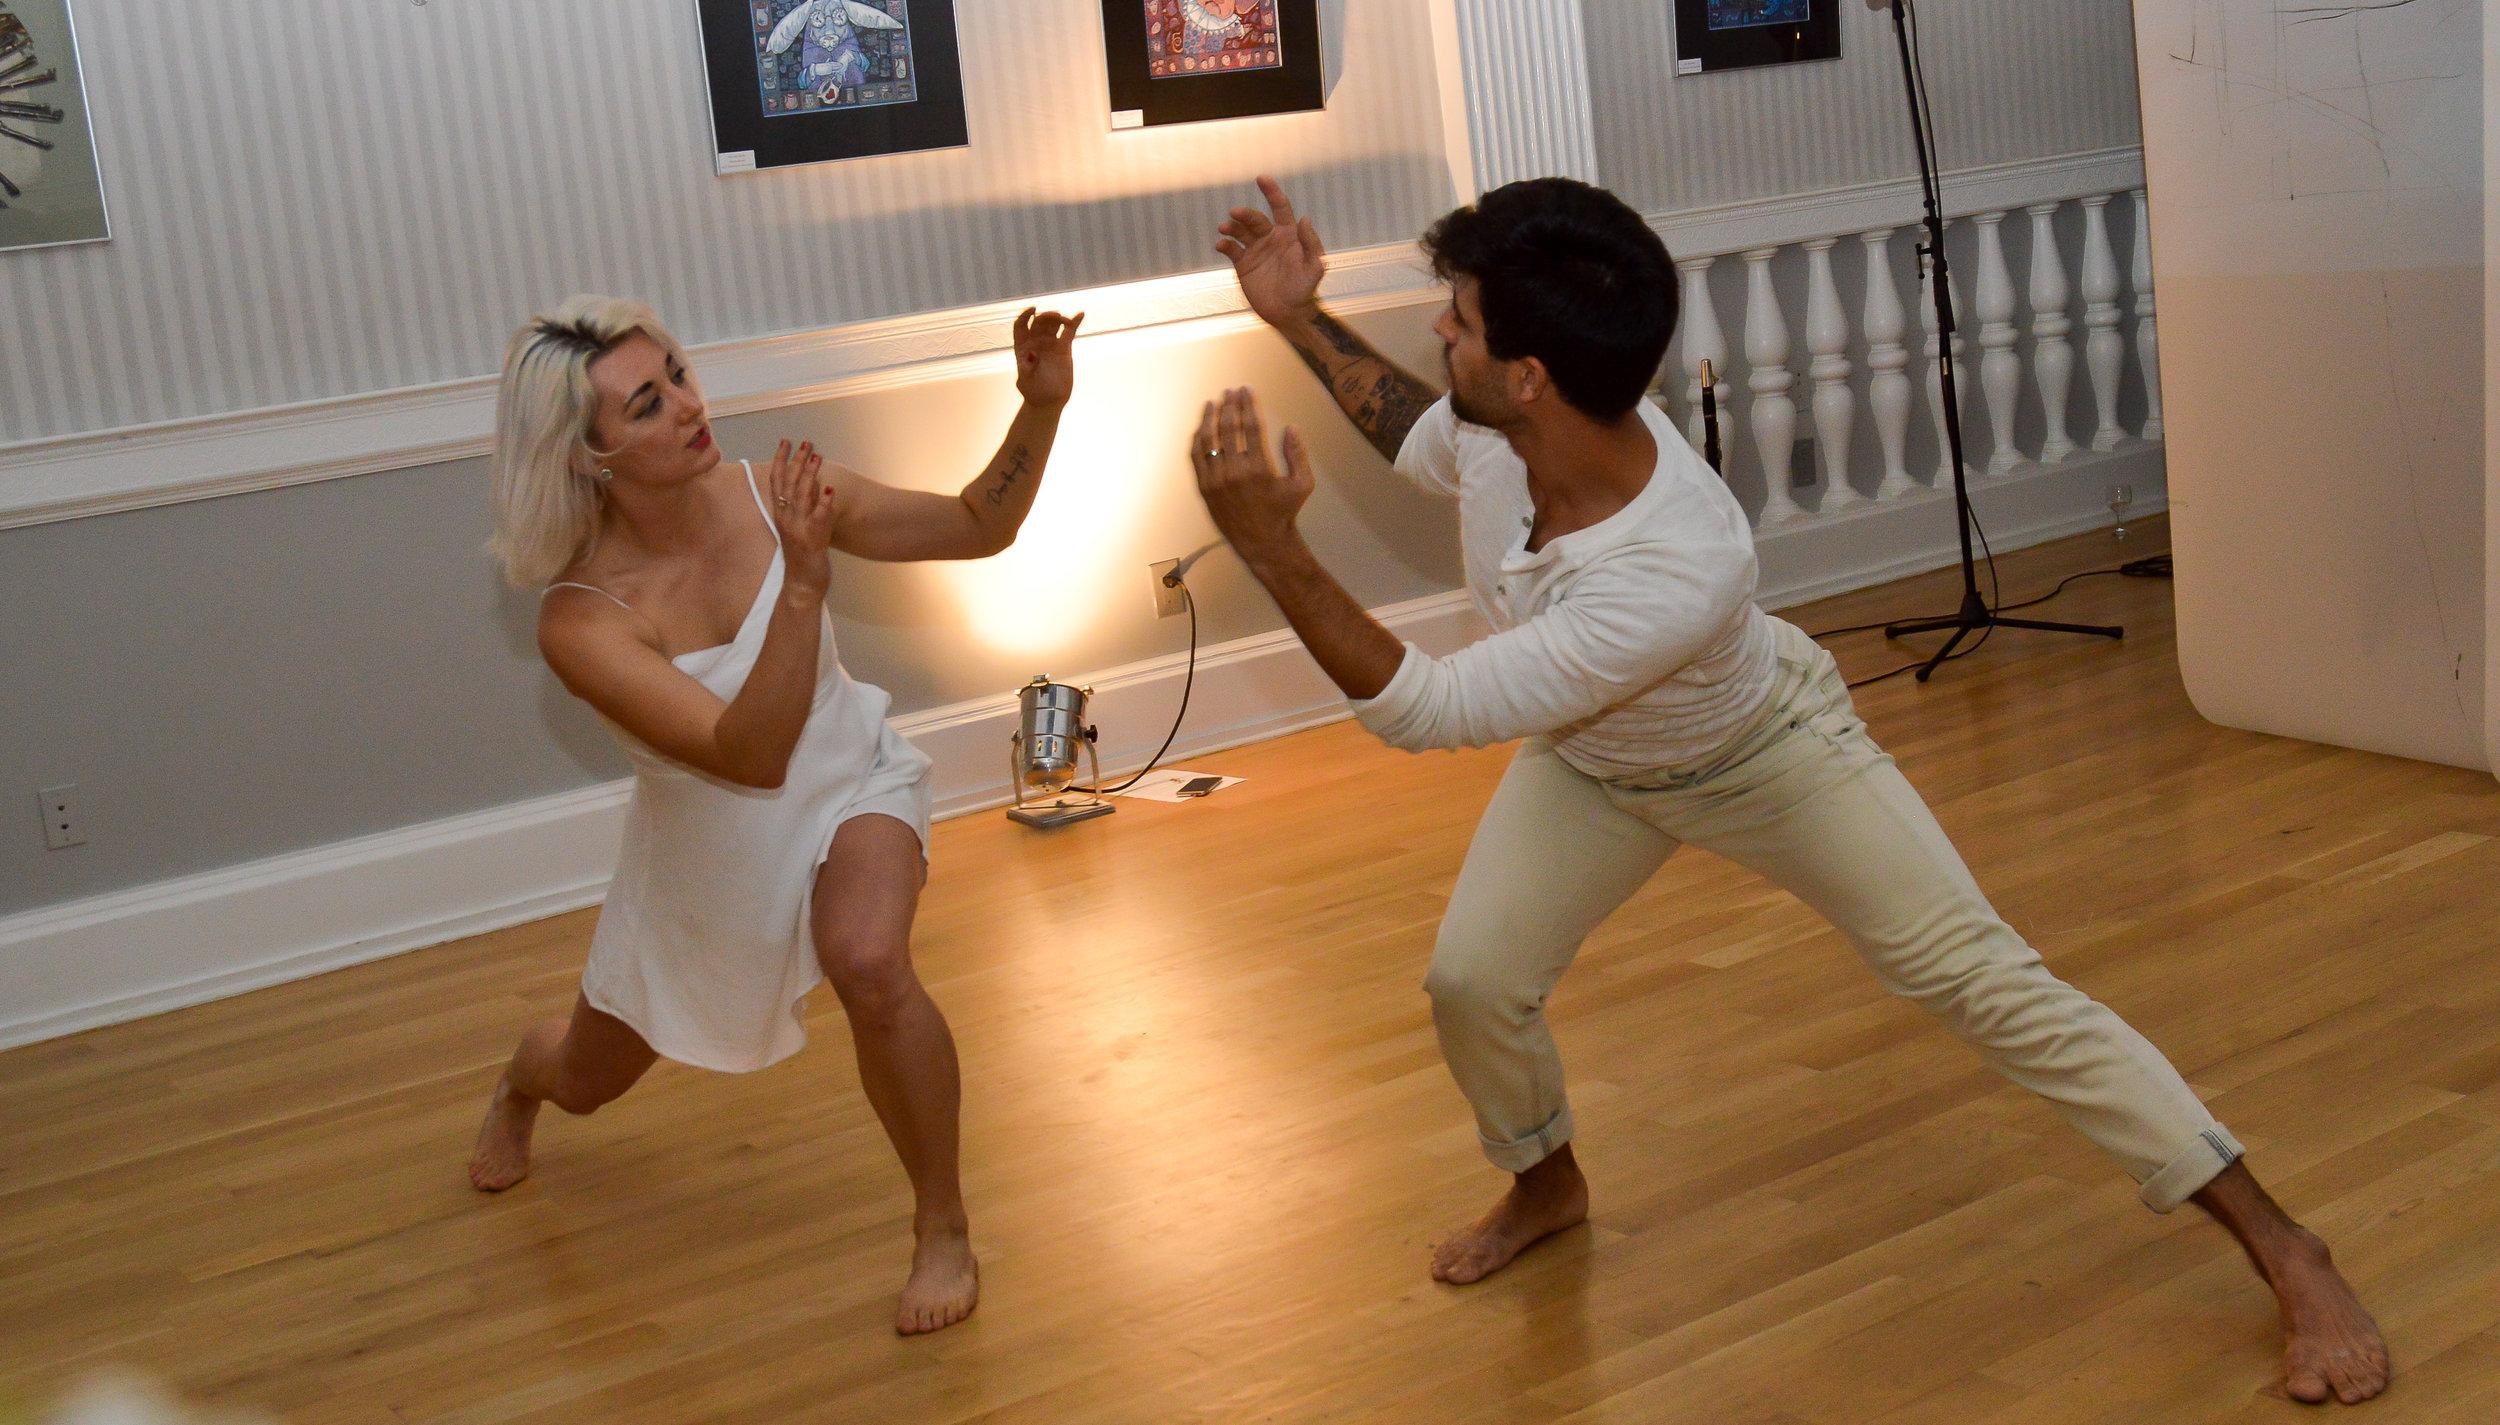 Diina Tamm & James Koroni - Performance 3